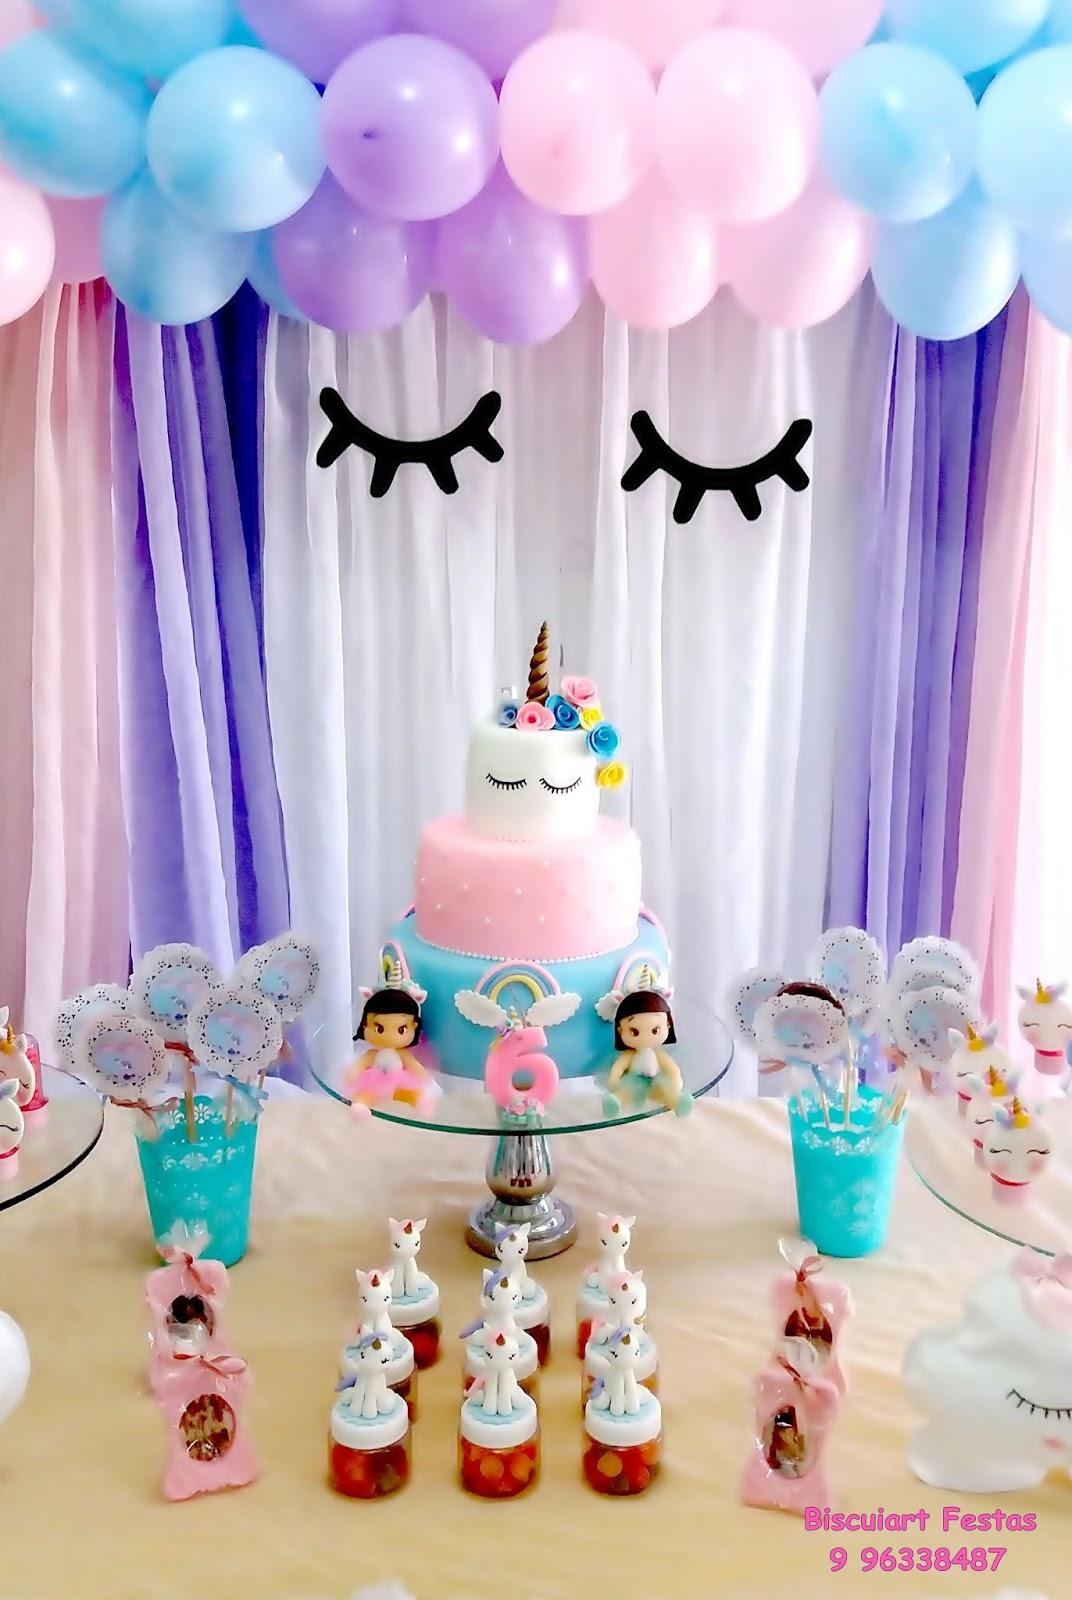 Biscuiart Festas festa unicórnio, decoraç u00e3o unicórnio, mimos unicórnio, bolo unicórnio # Decoração De Festa Unicórnio Infantil